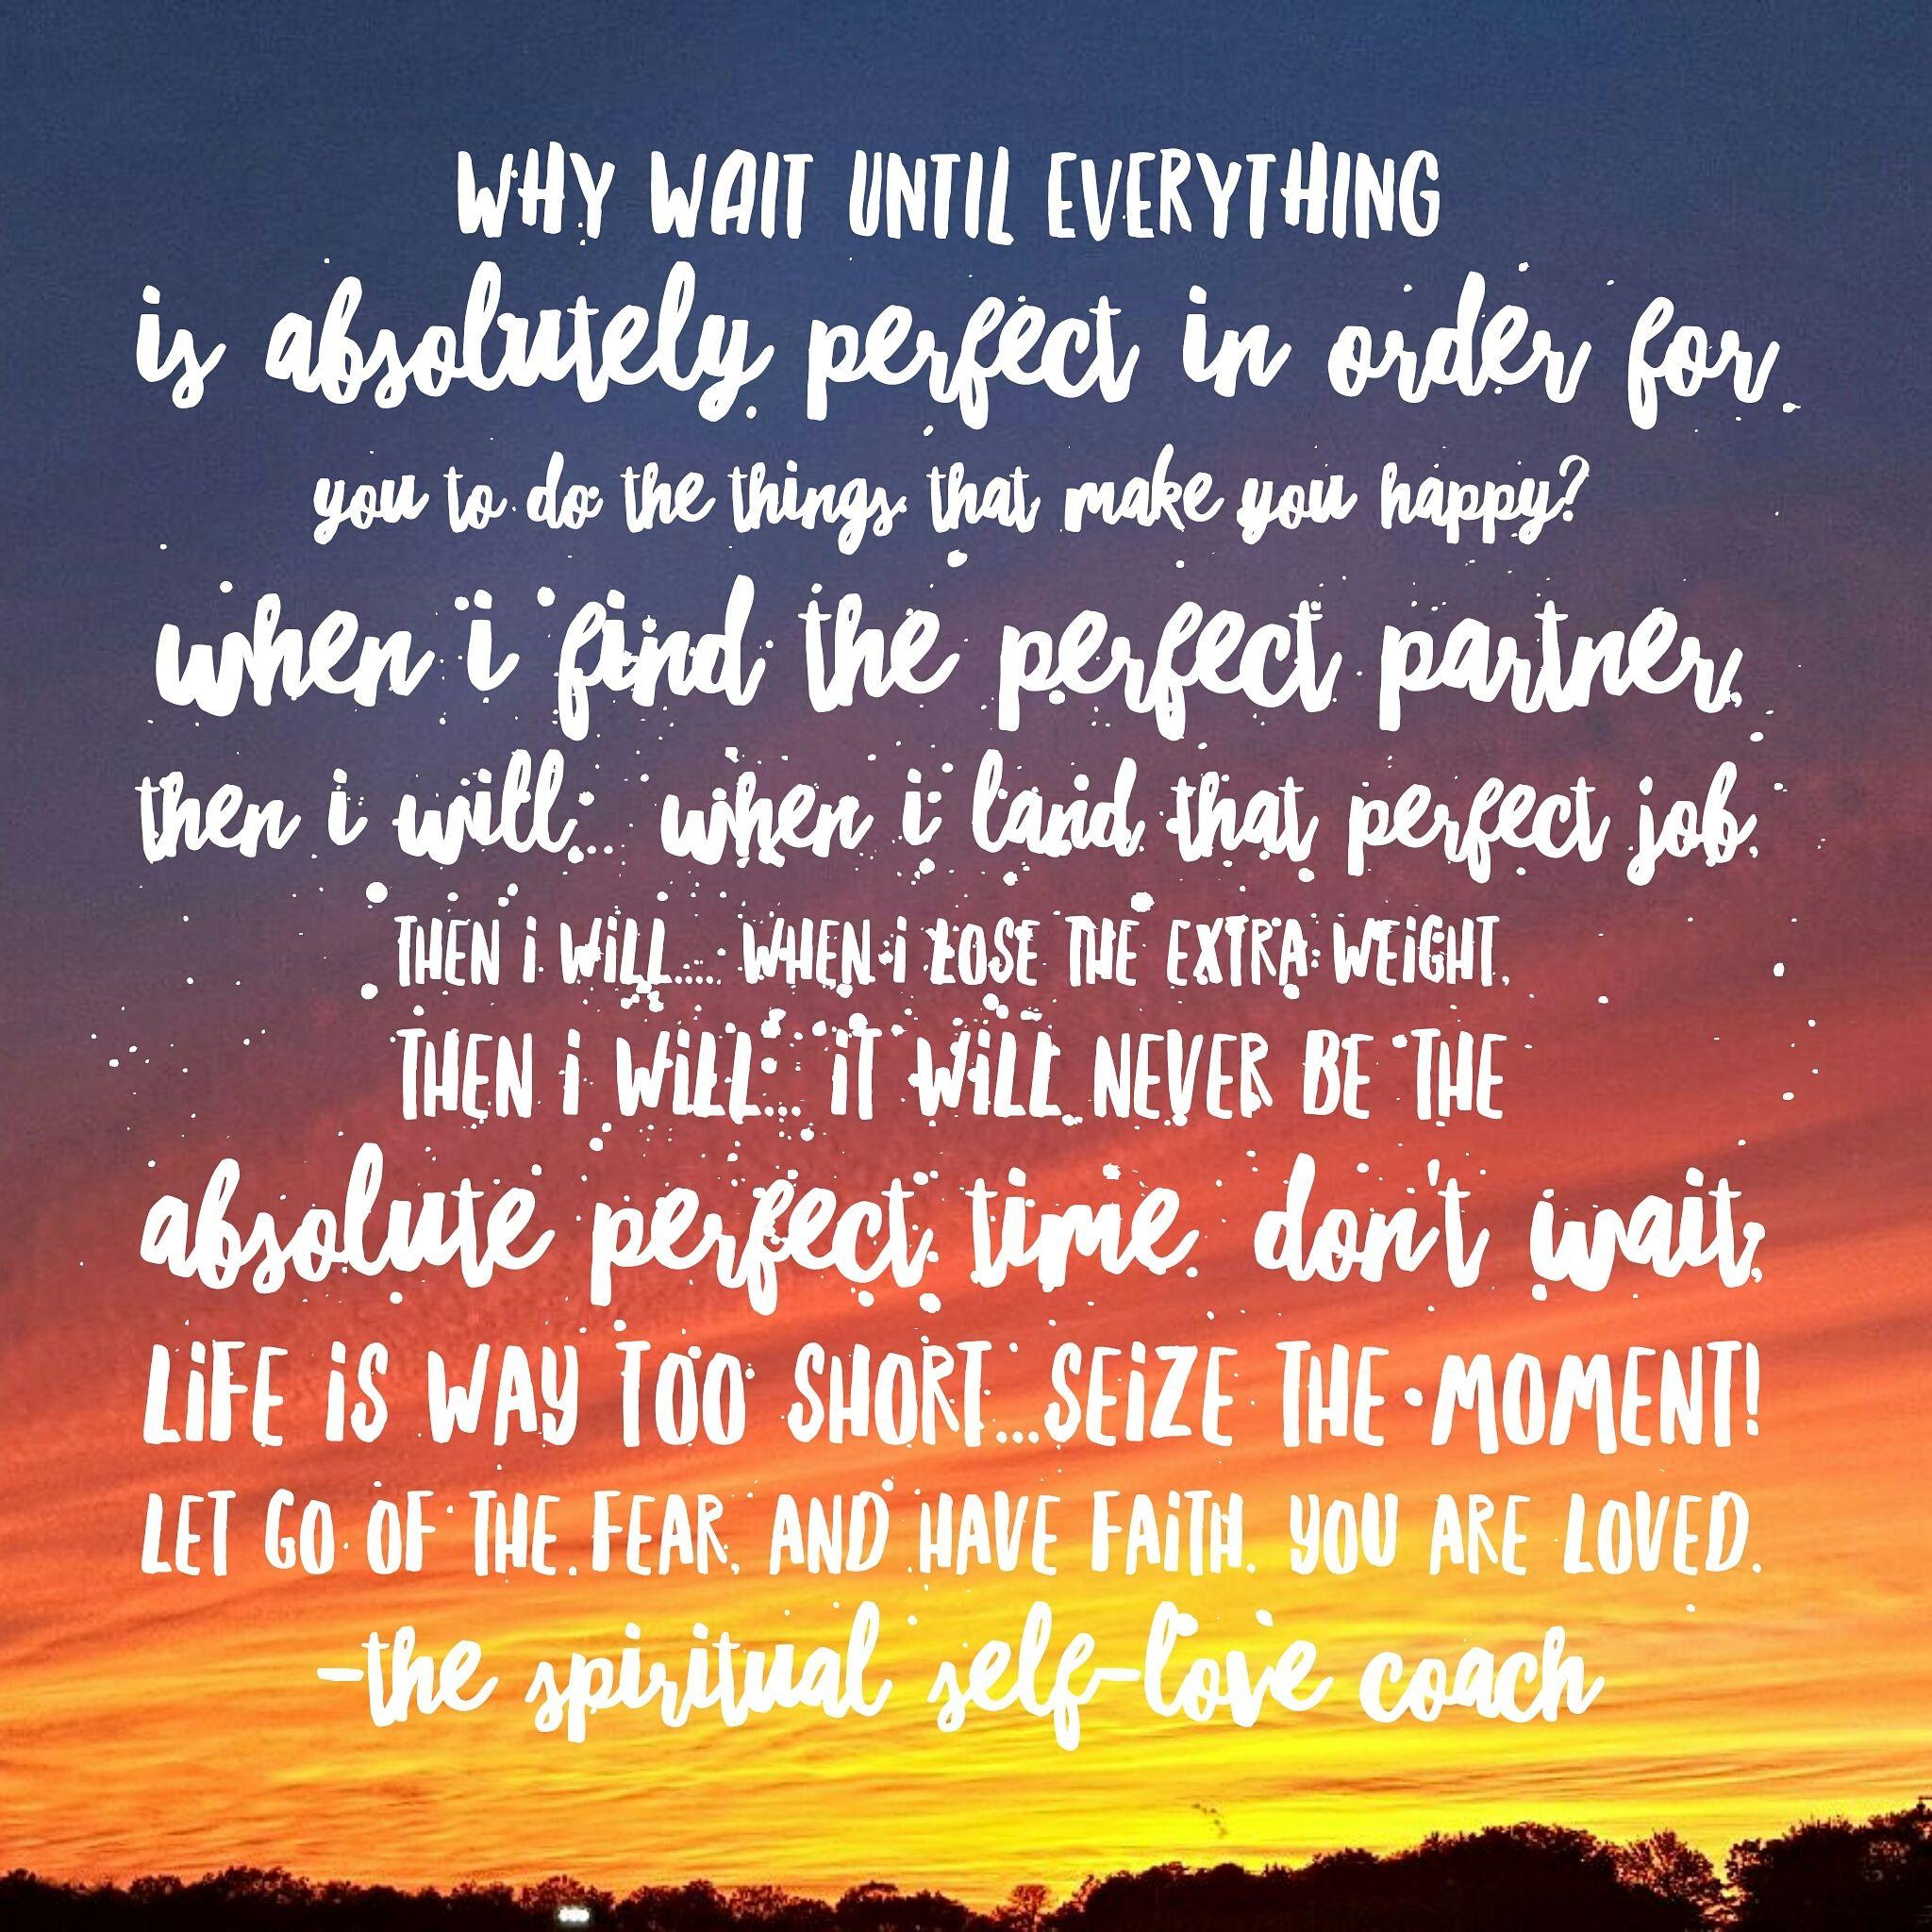 Spiritual Inspirational Quotes Pinthe Spiritual Selflove Coach On Inspirational Quotes From